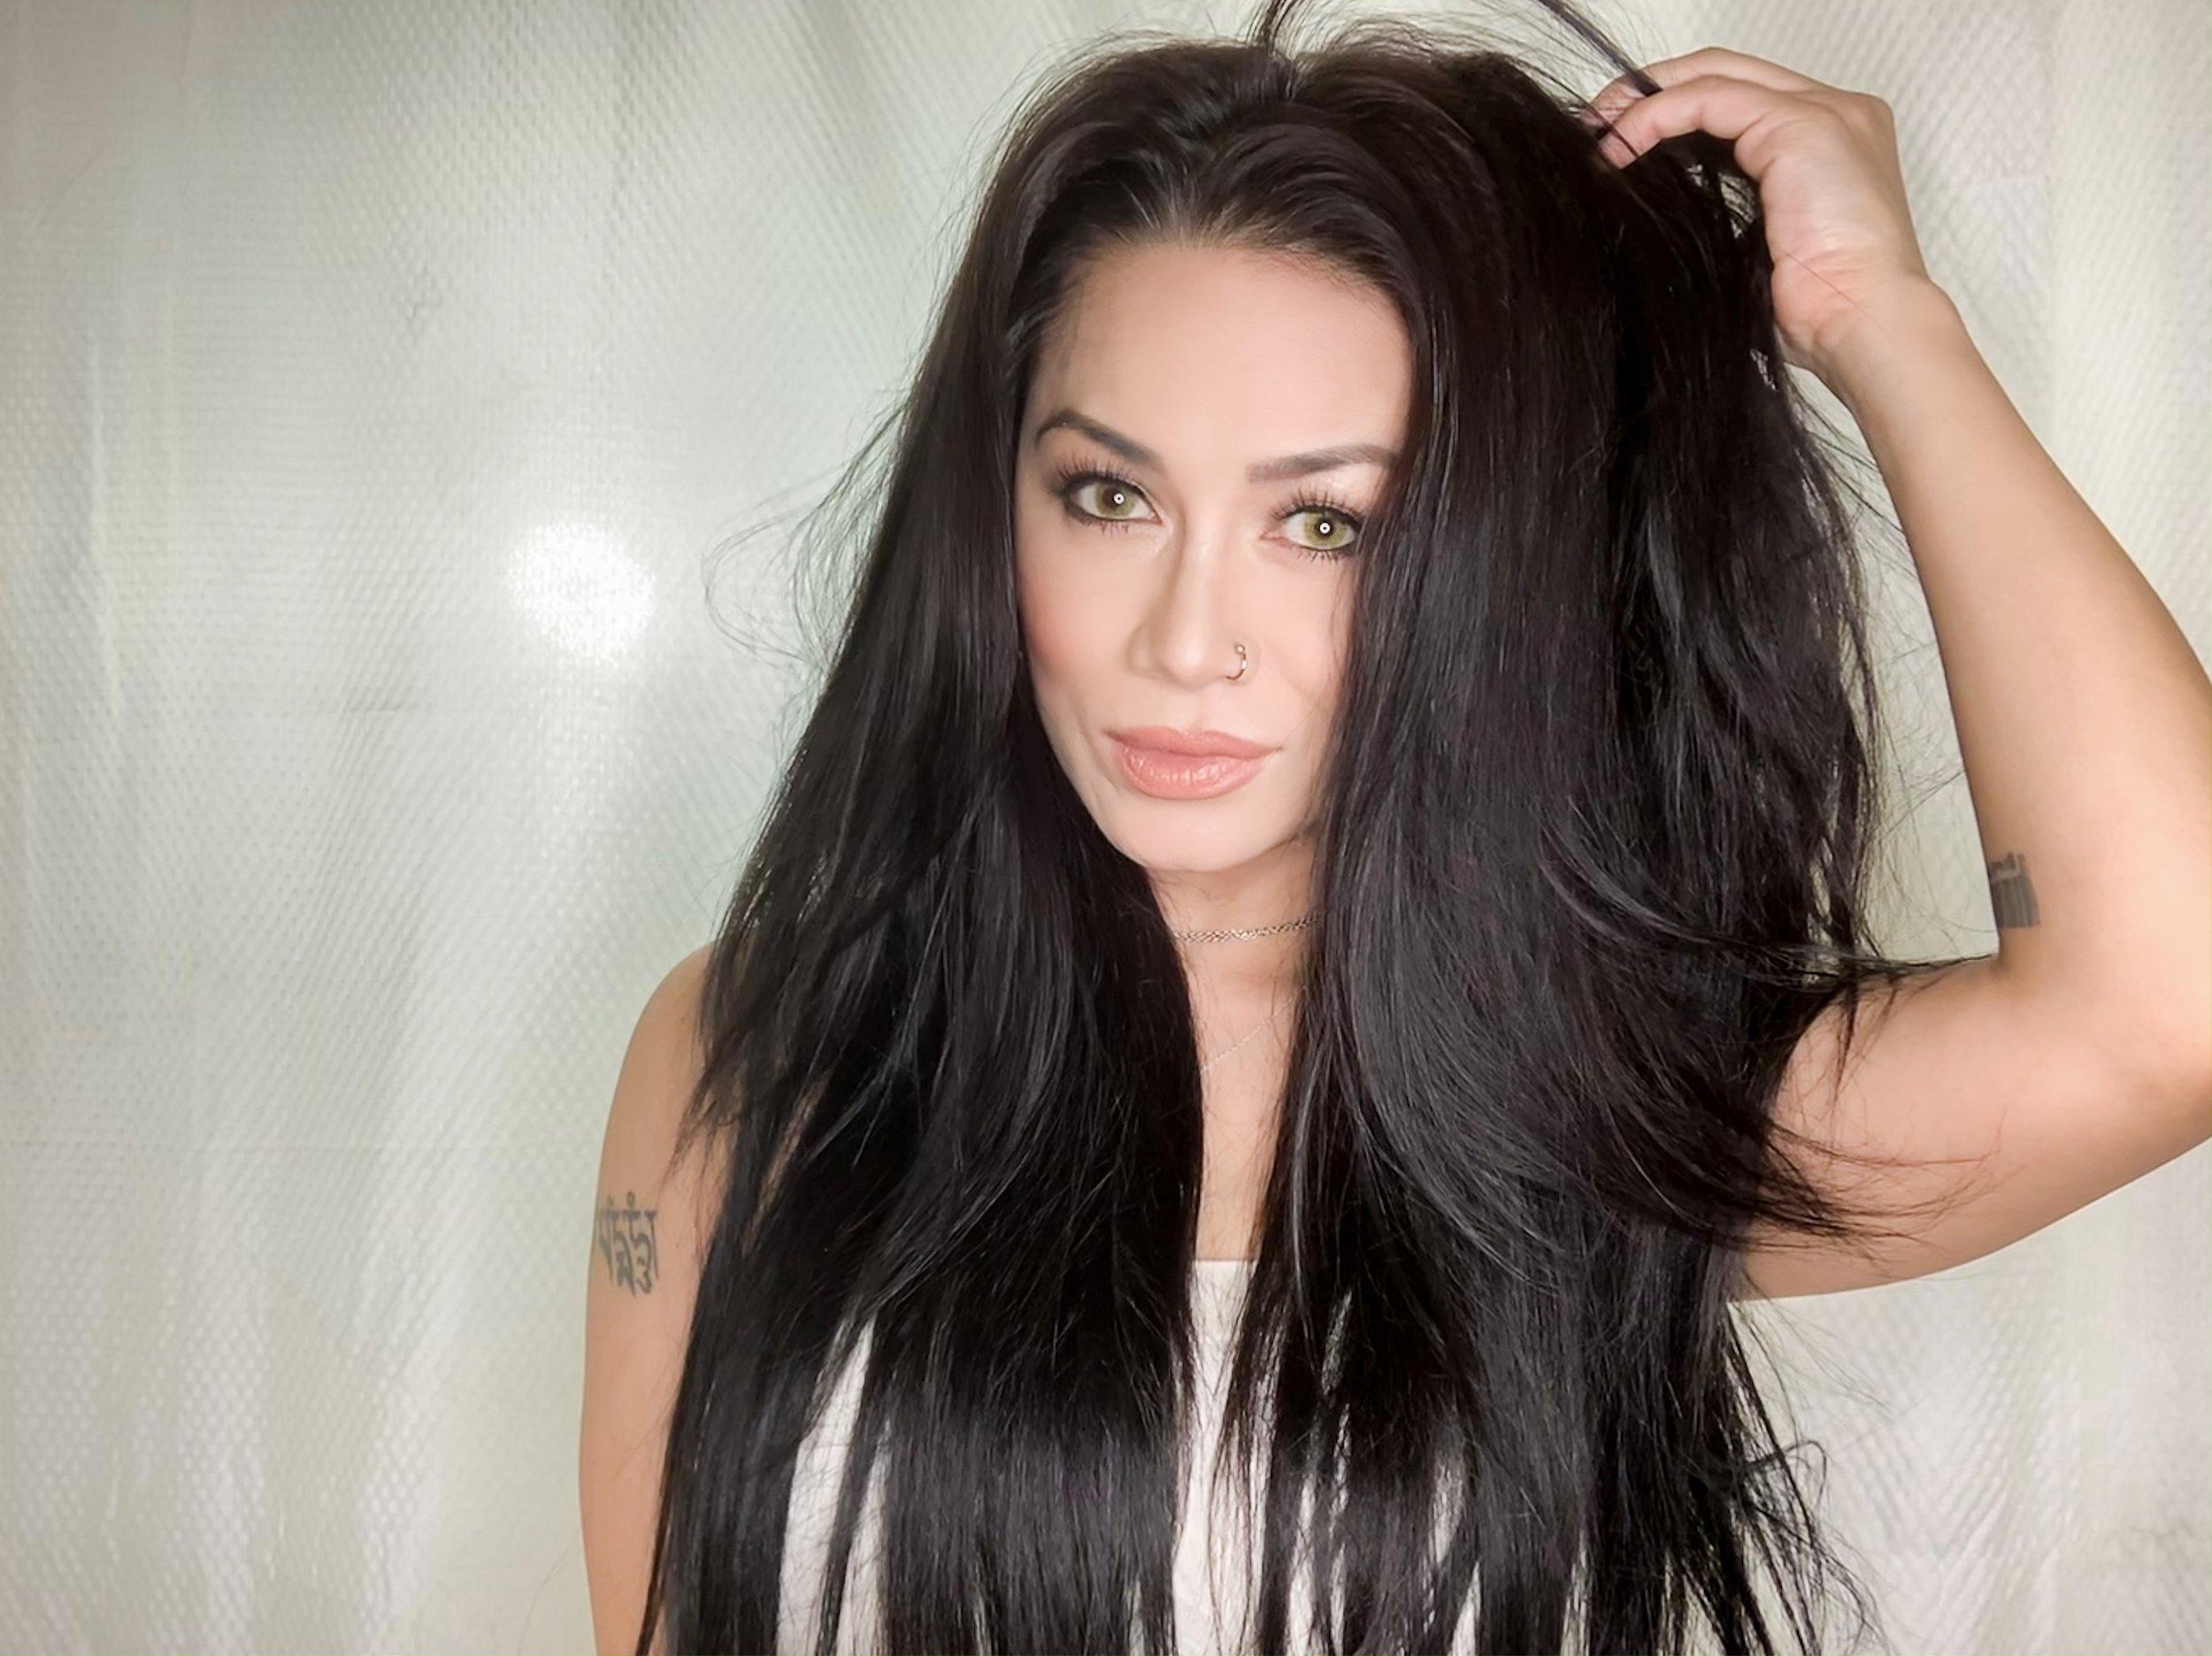 After Brazilian Goddess Remy Hair Application!